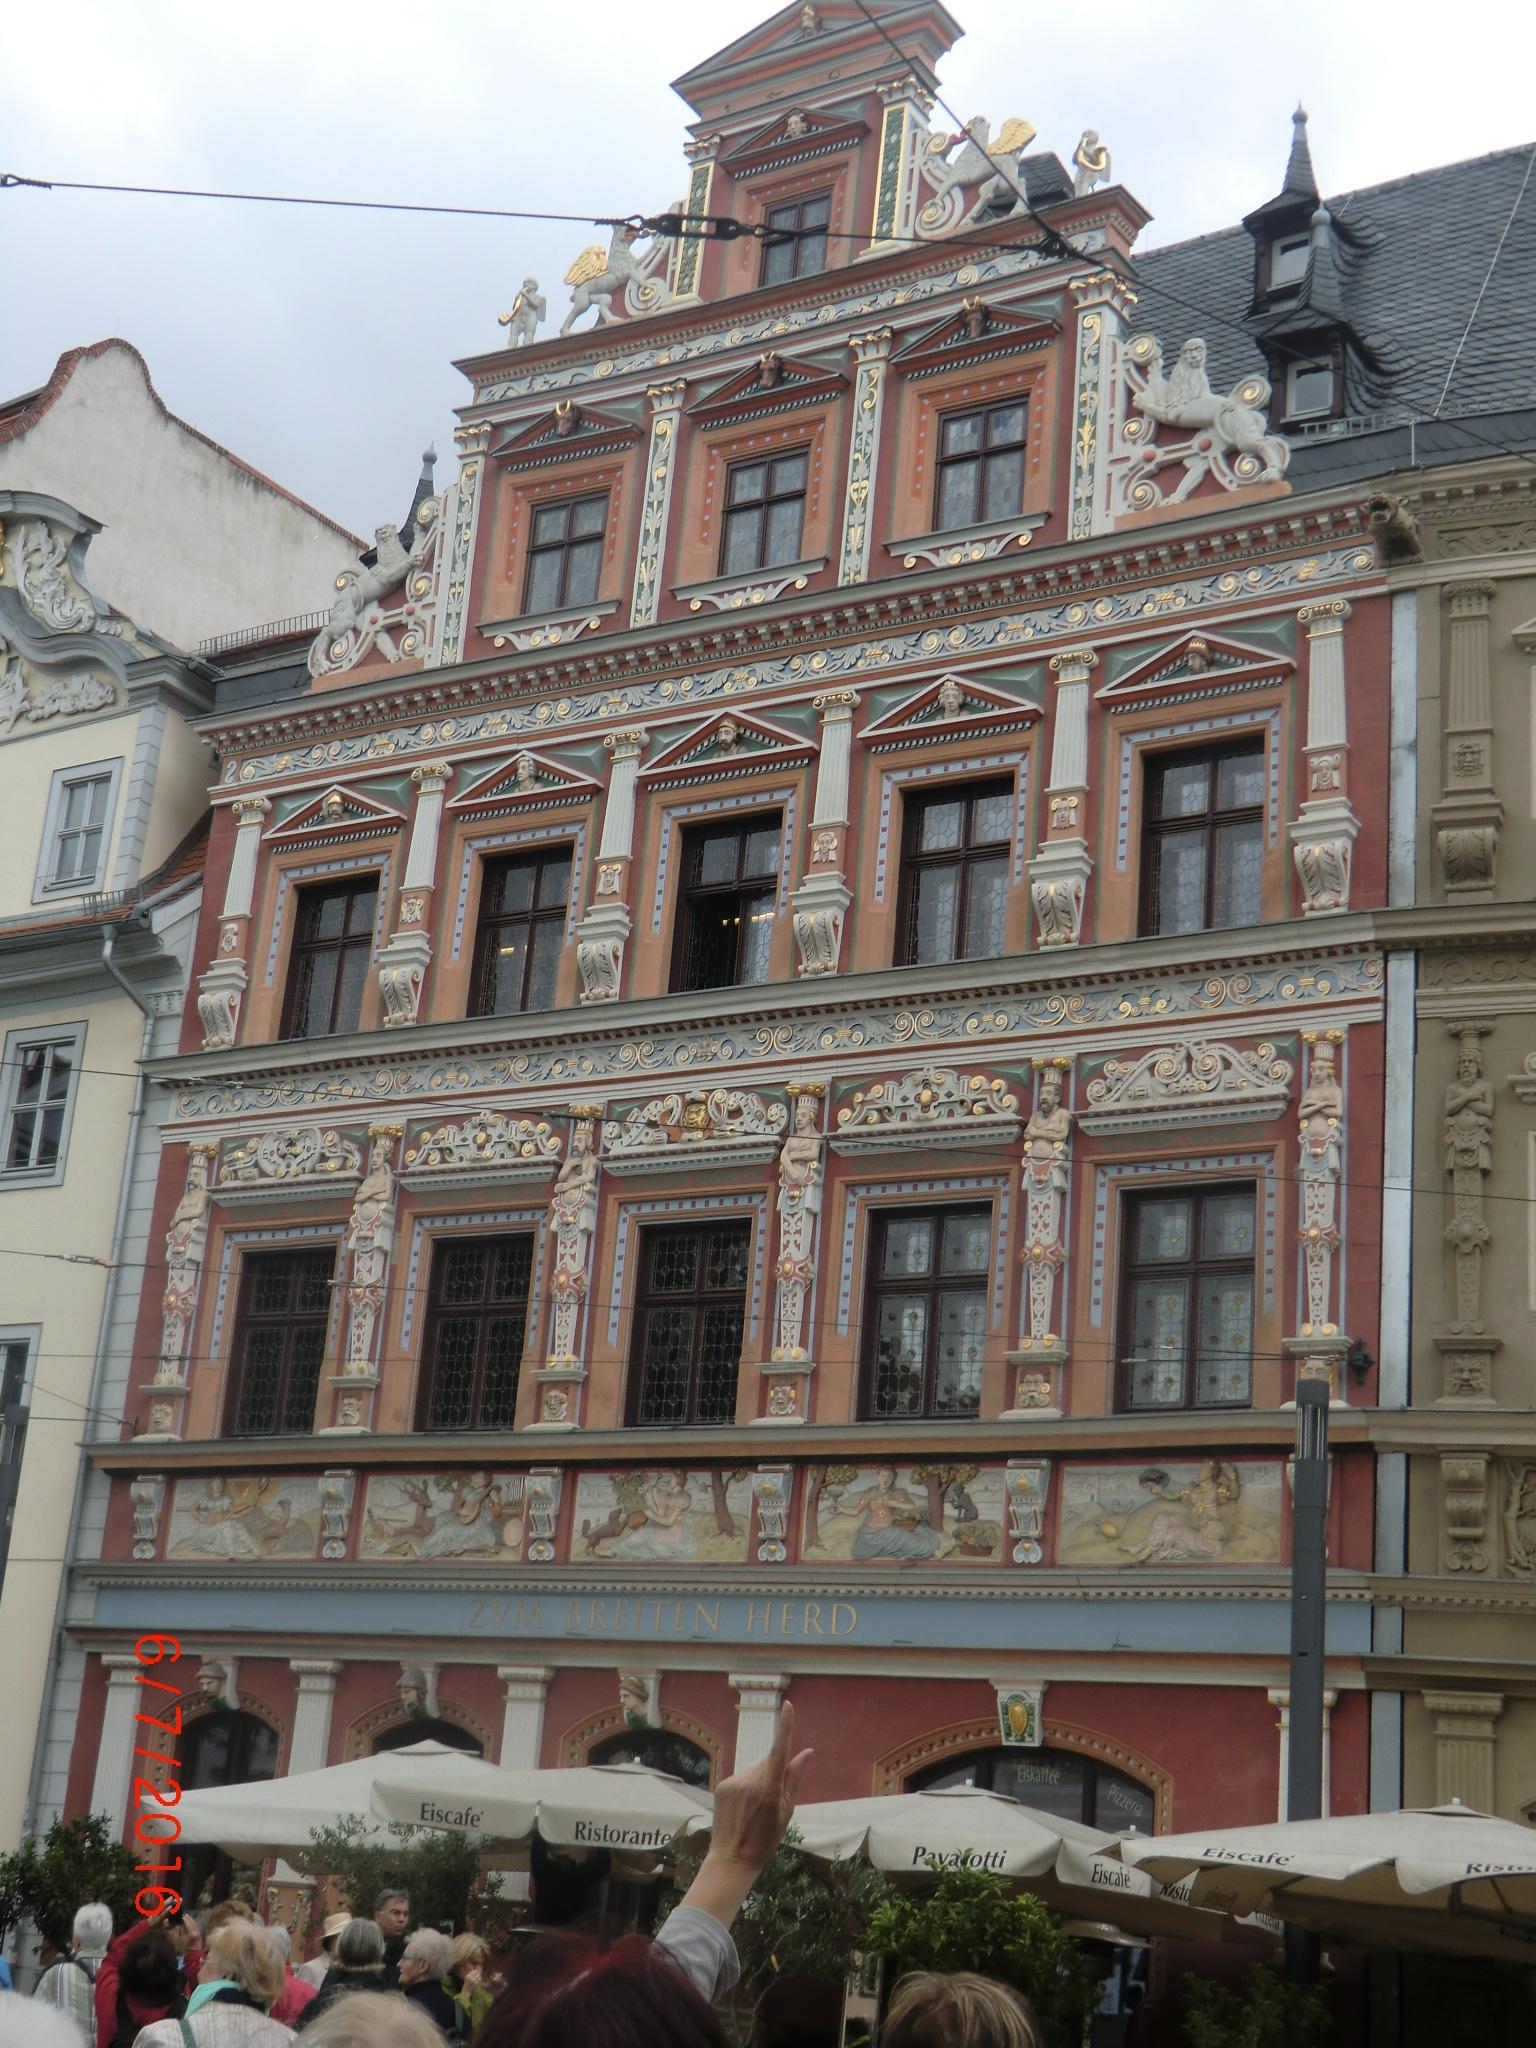 Giebel in Erfurt